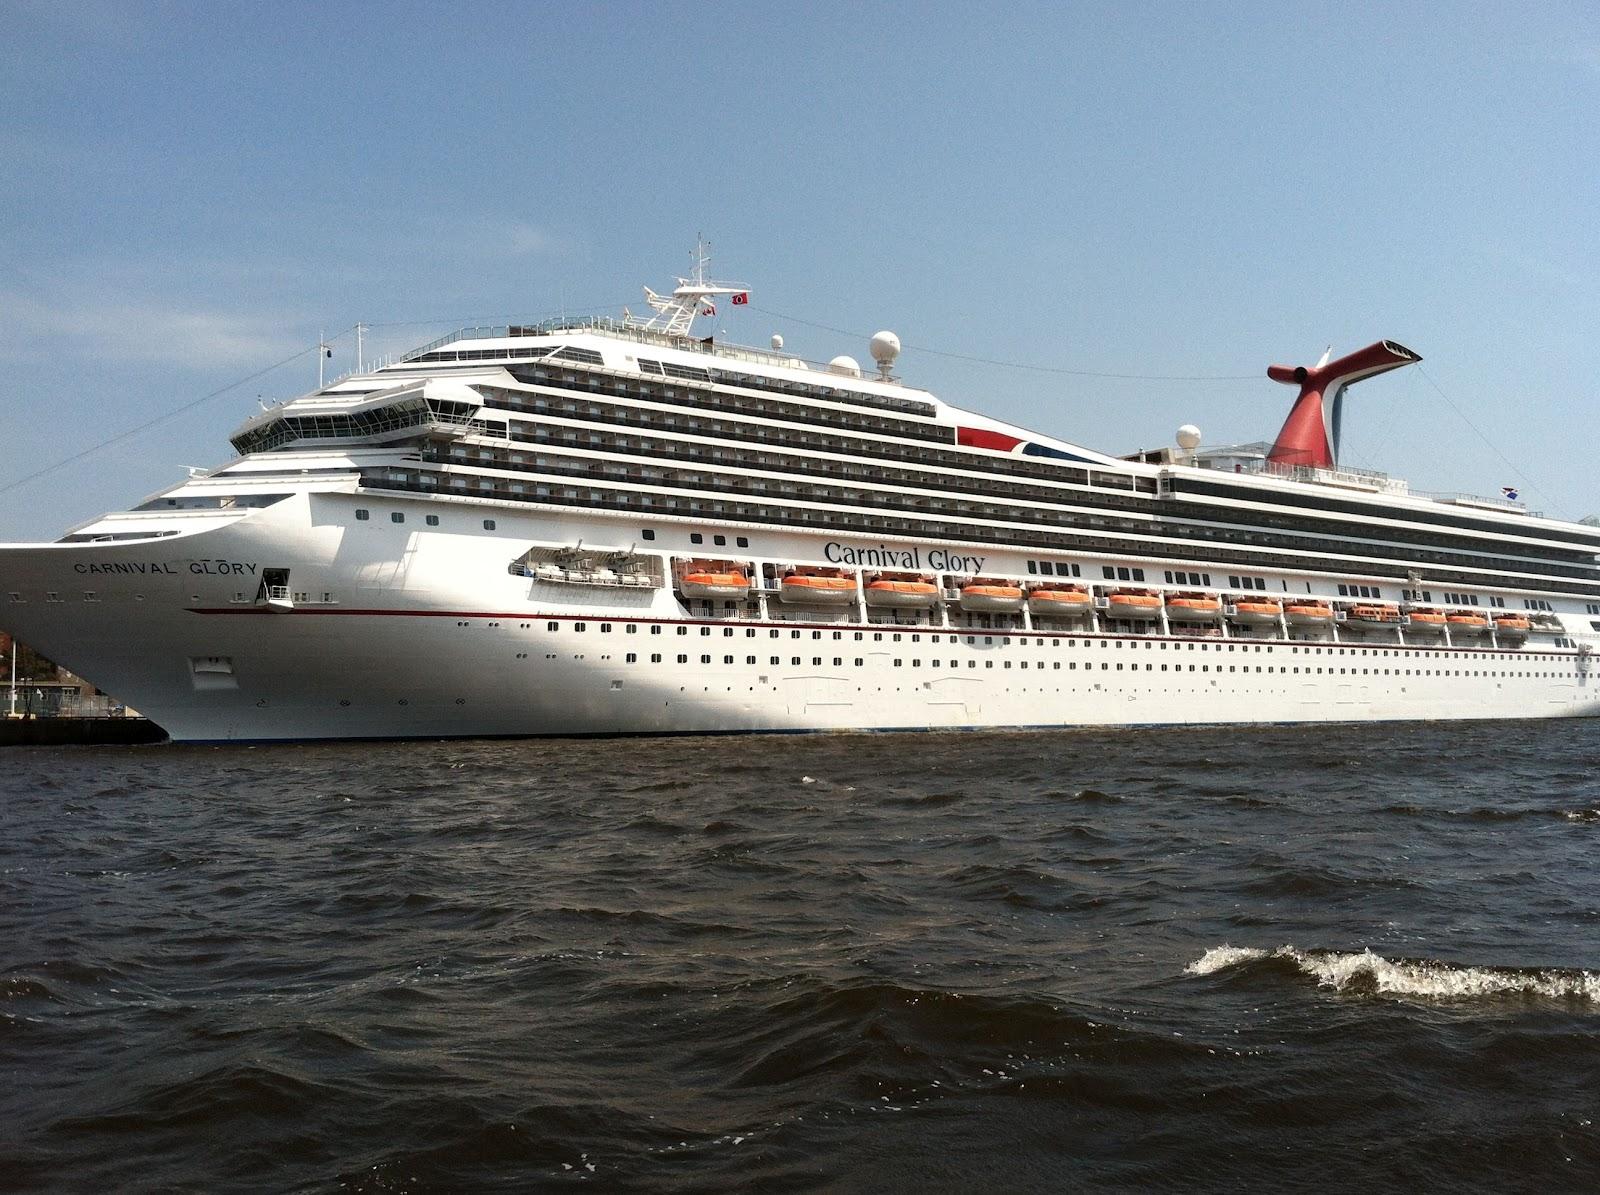 Ray S Cruise Blog Carnival Glory